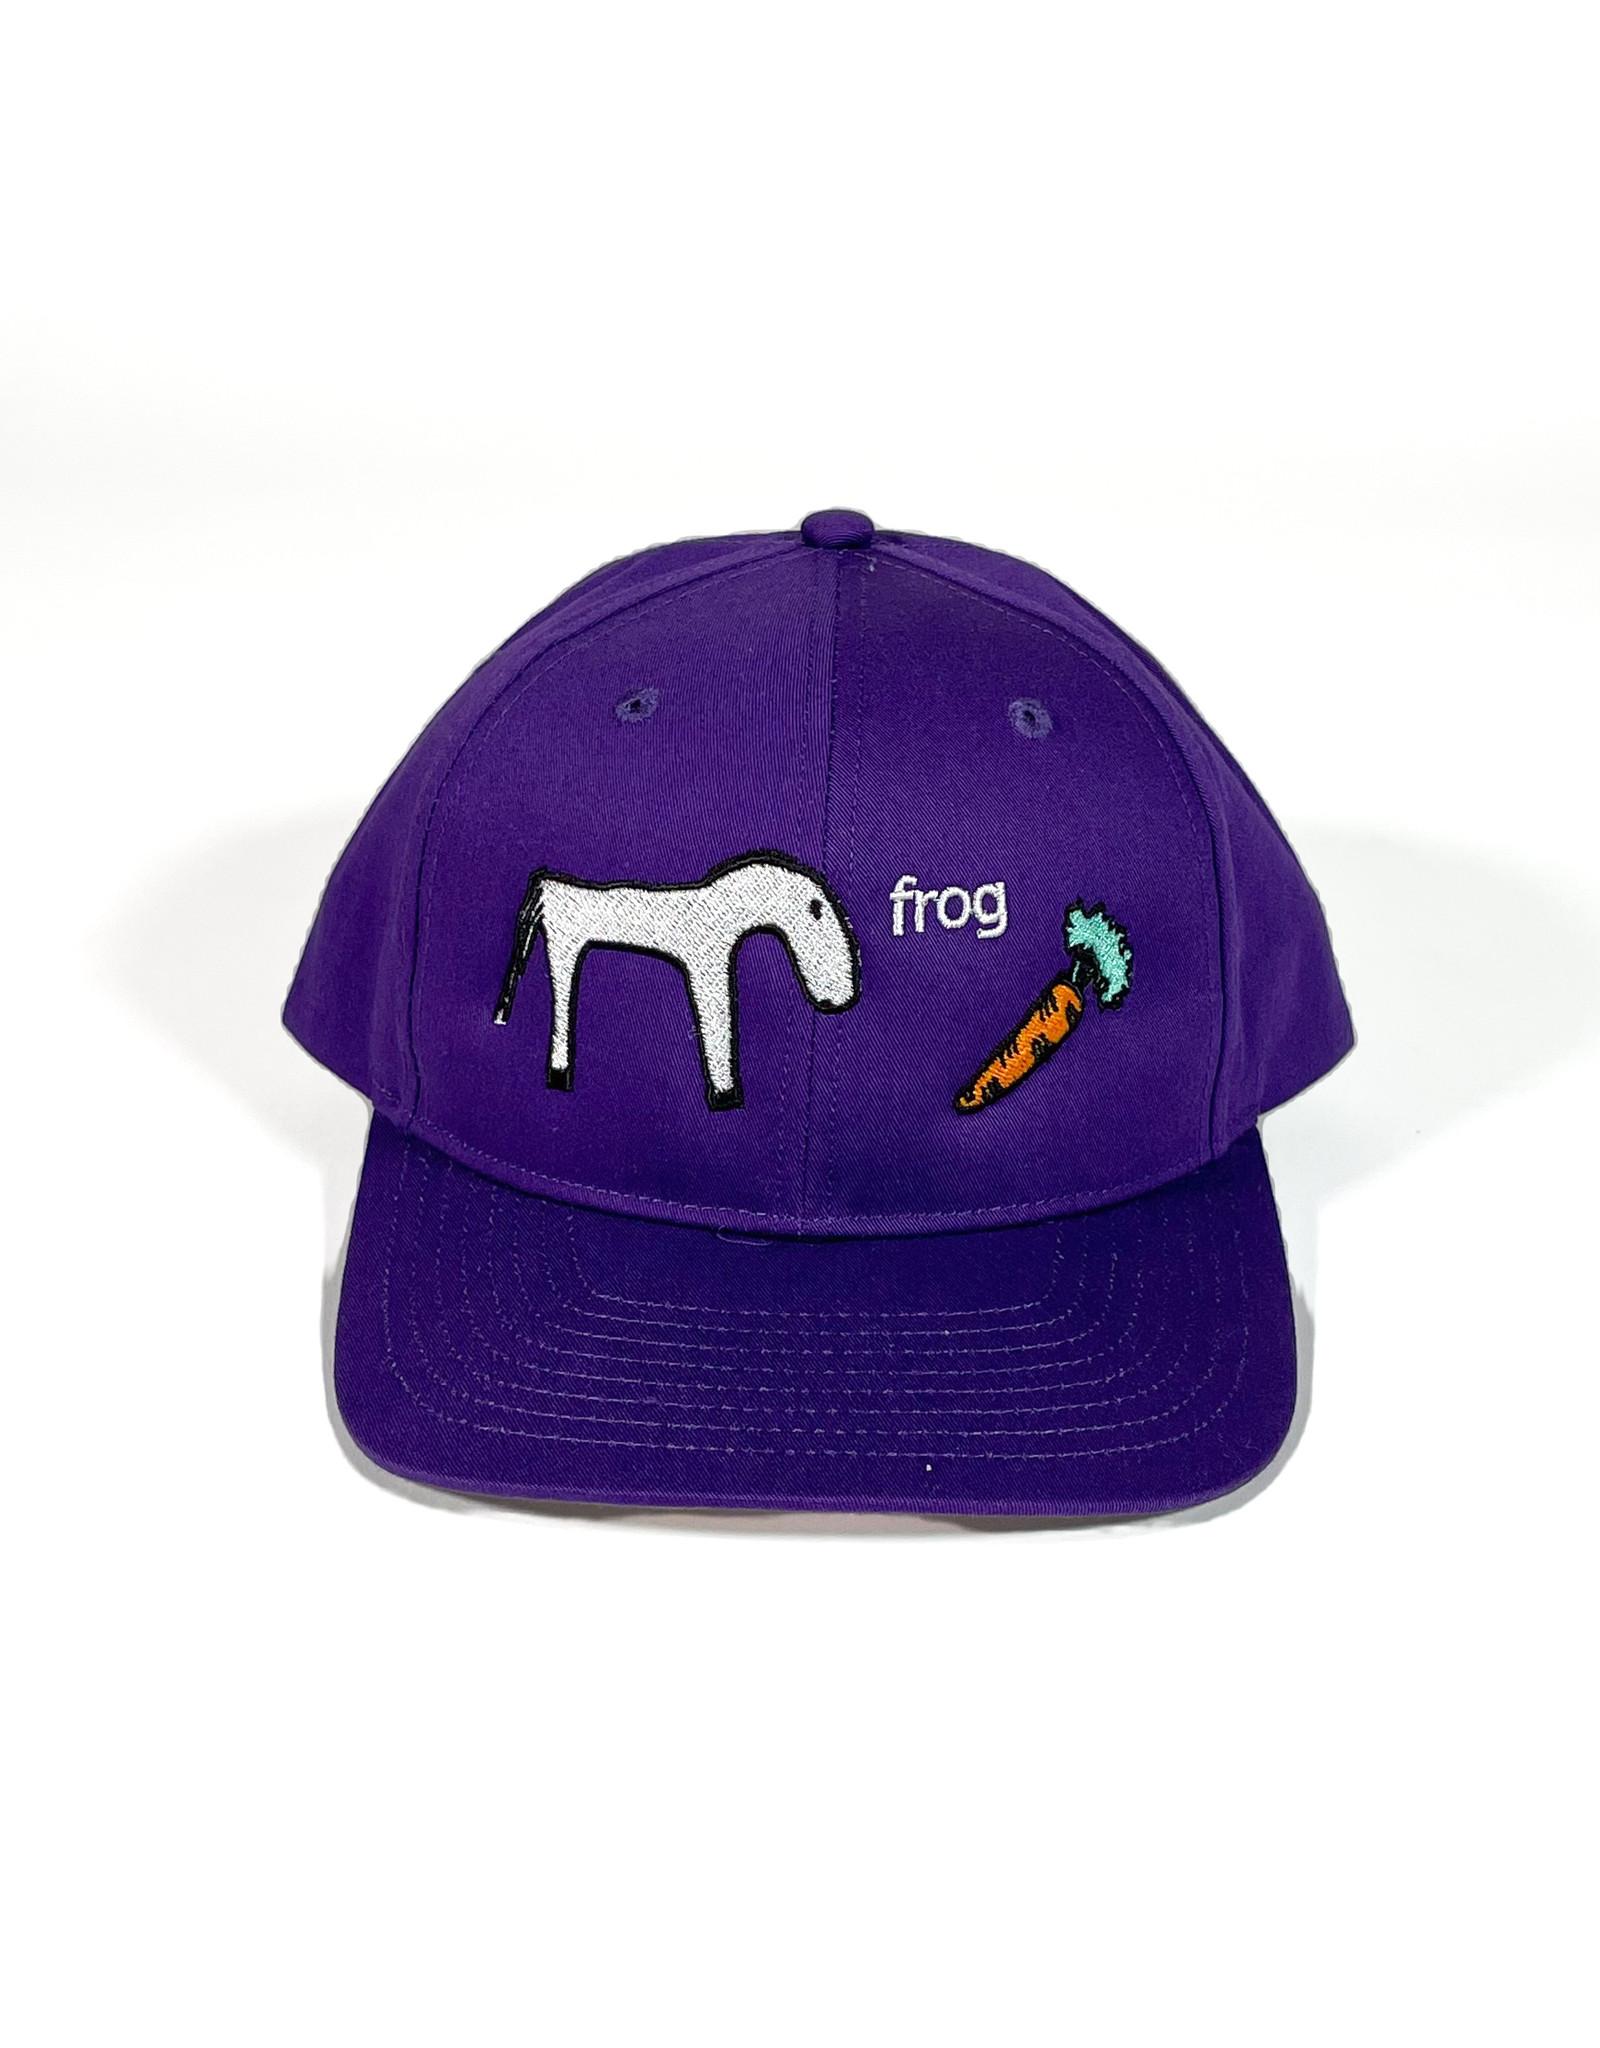 FROG FROG HORSE 5 PANEL HAT - PURPLE